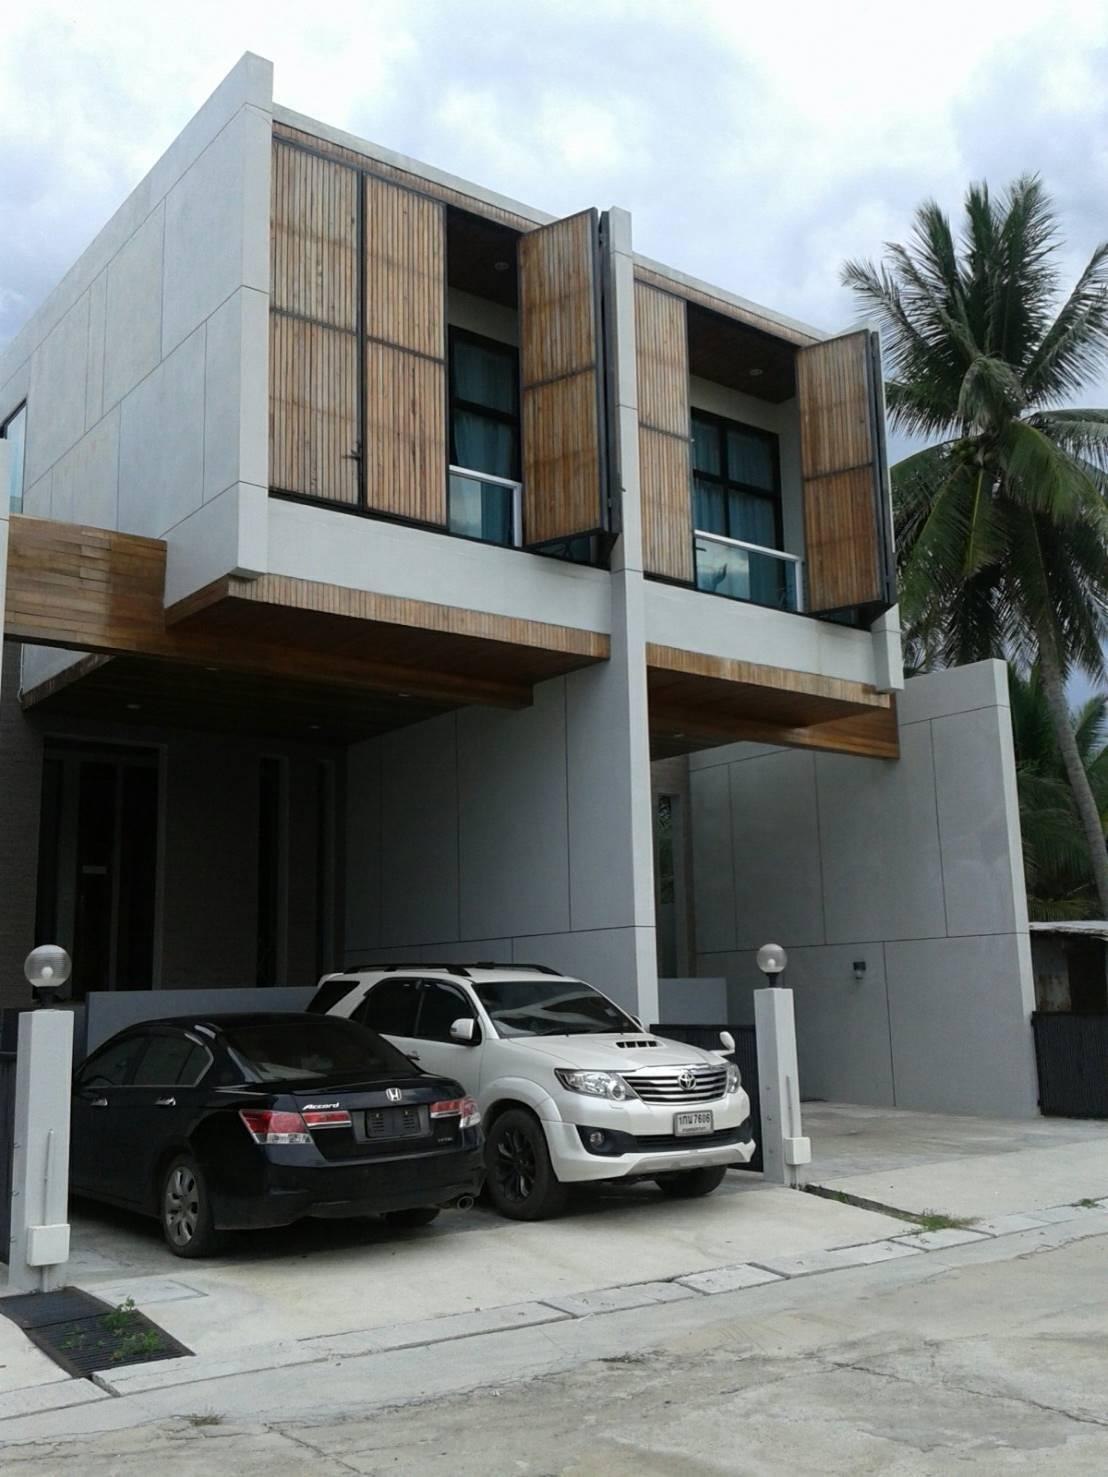 VIP Beach Sivilai (T8) Town Home Beach Front บ้านเดี่ยว 3 ห้องนอน 3 ห้องน้ำส่วนตัว ขนาด 65 ตร.ม. – ใกล้ใจกลางเมือง